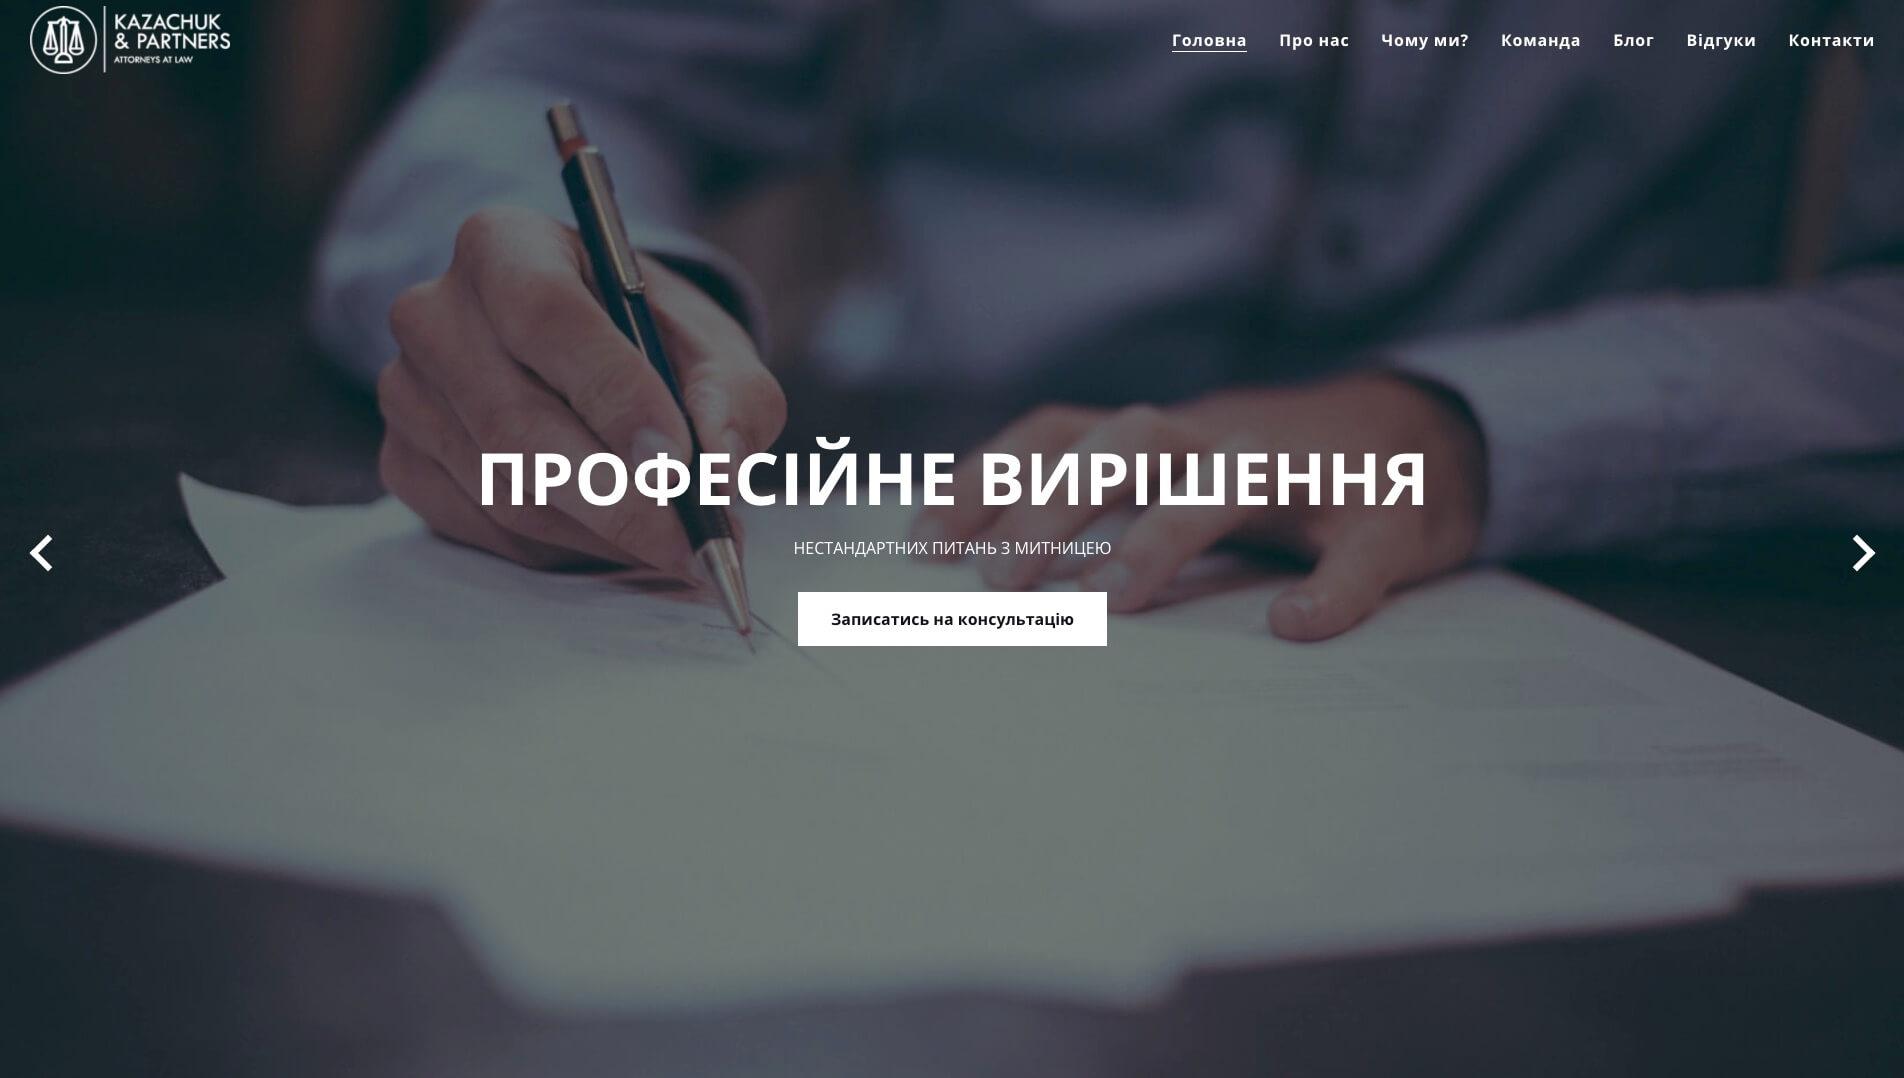 kazach_1